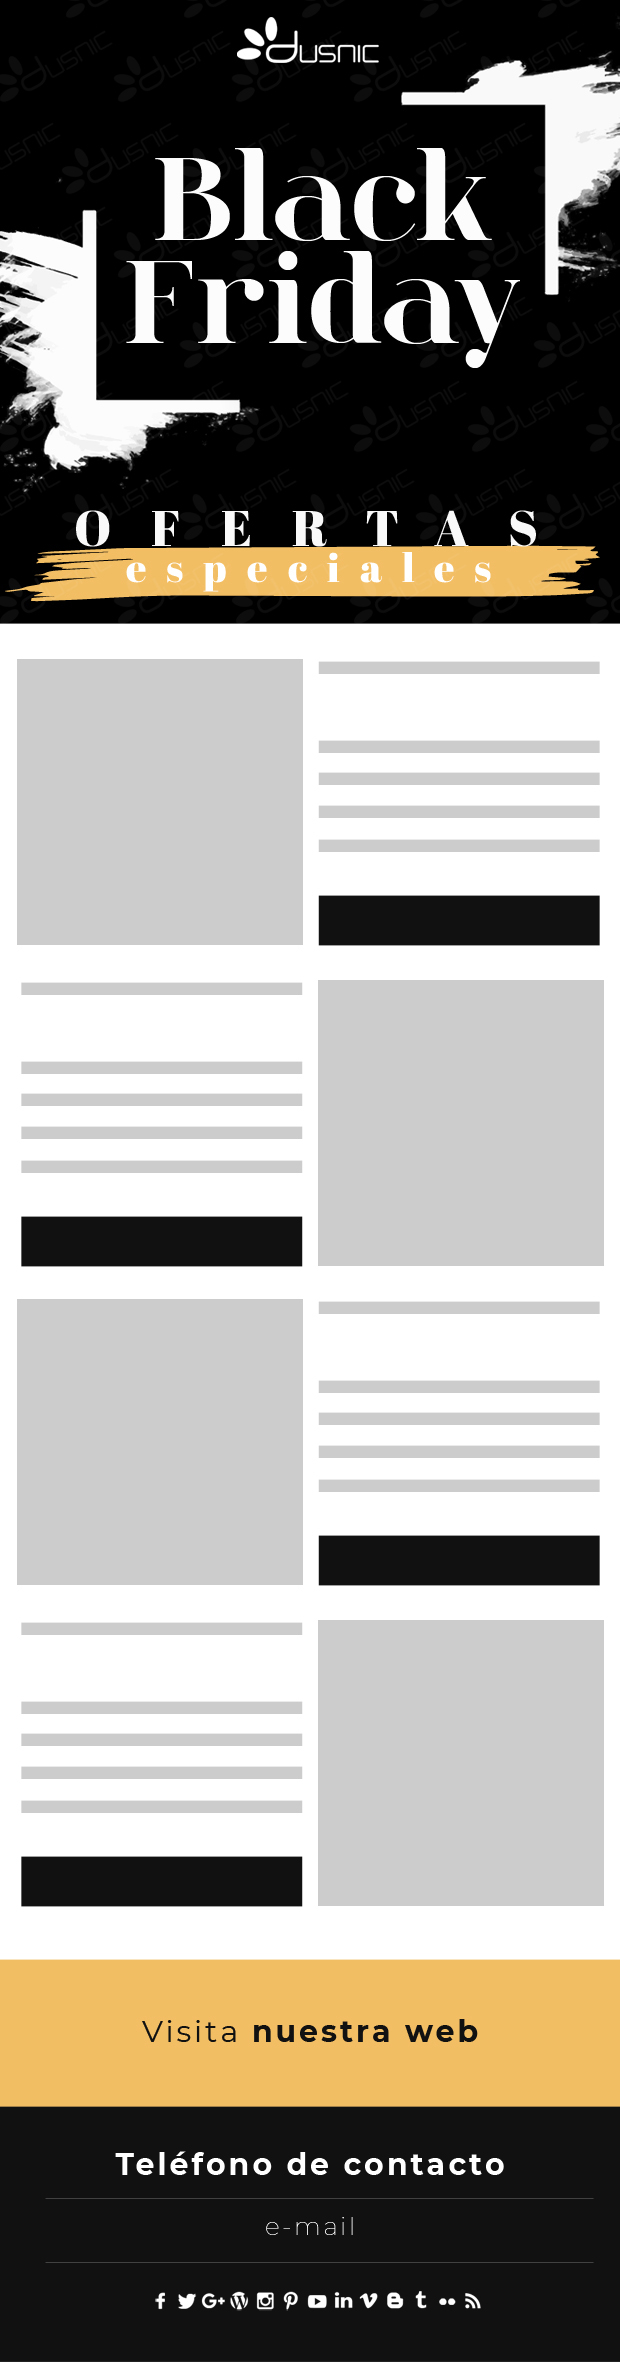 marca-boletines-blackfriday-3-2-copia.jpg